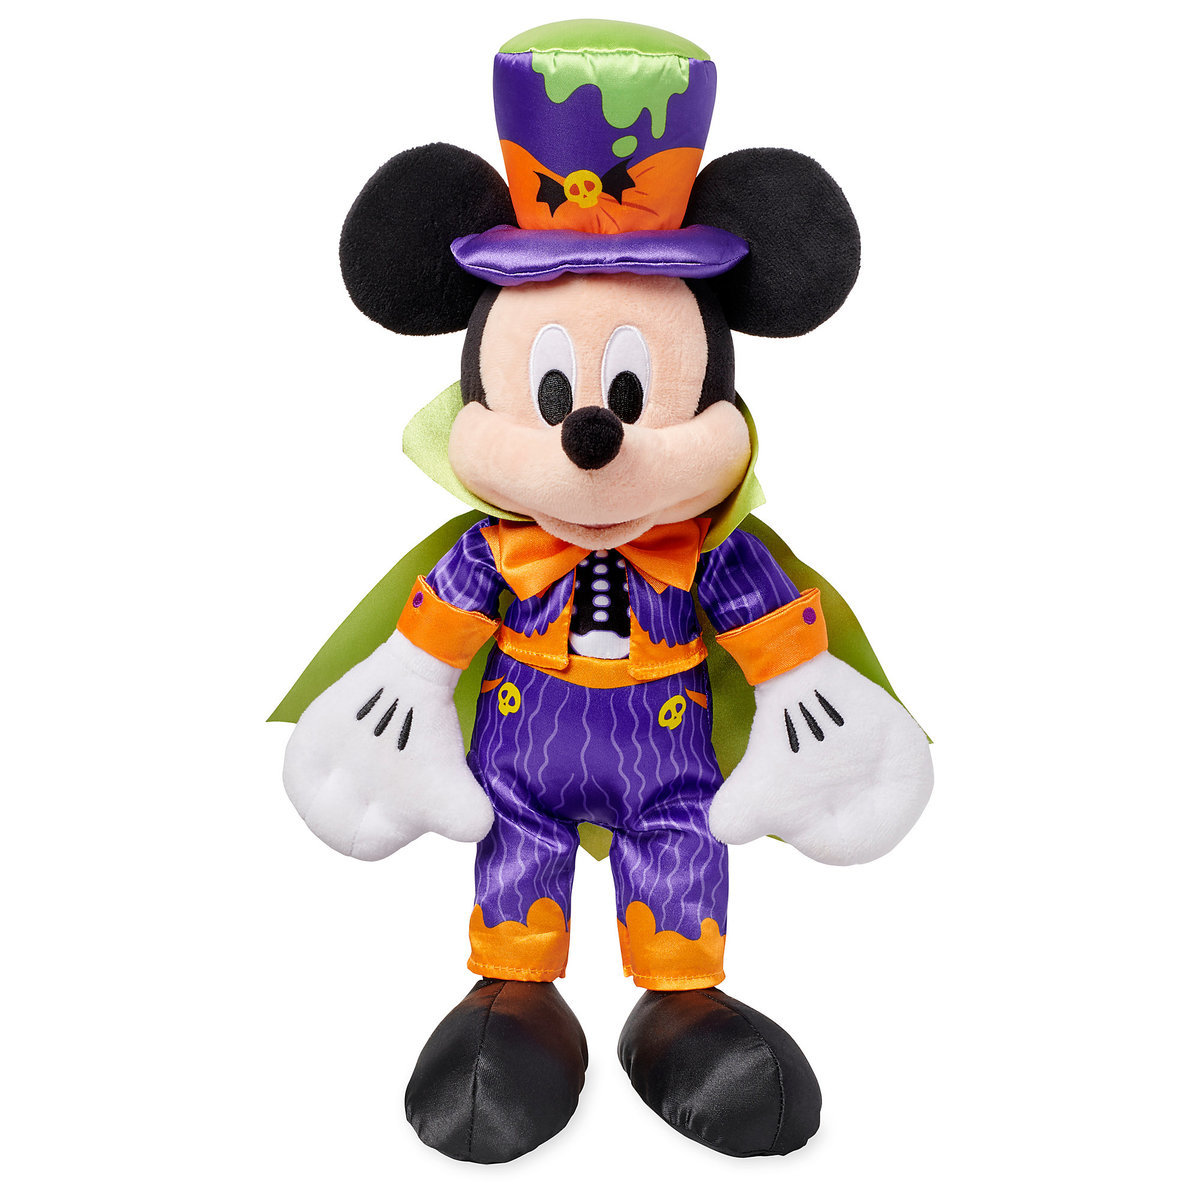 6daecbc5644 Product Image of Mickey Mouse Halloween Plush - 17     1